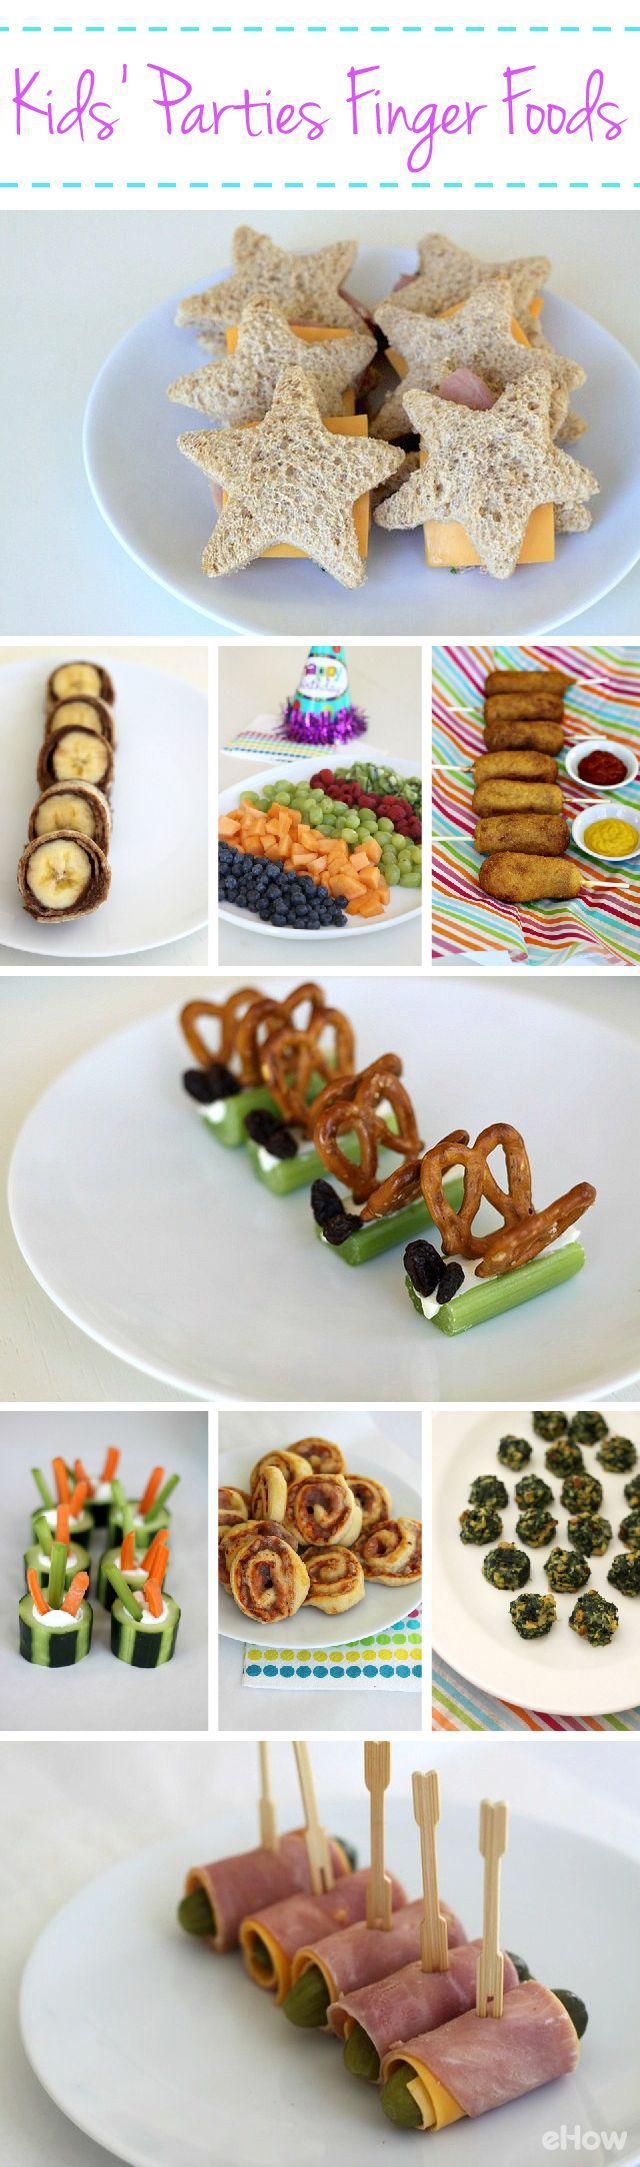 17 best images about abc snacks on pinterest easy finger - Fingerfood kindergarten ...